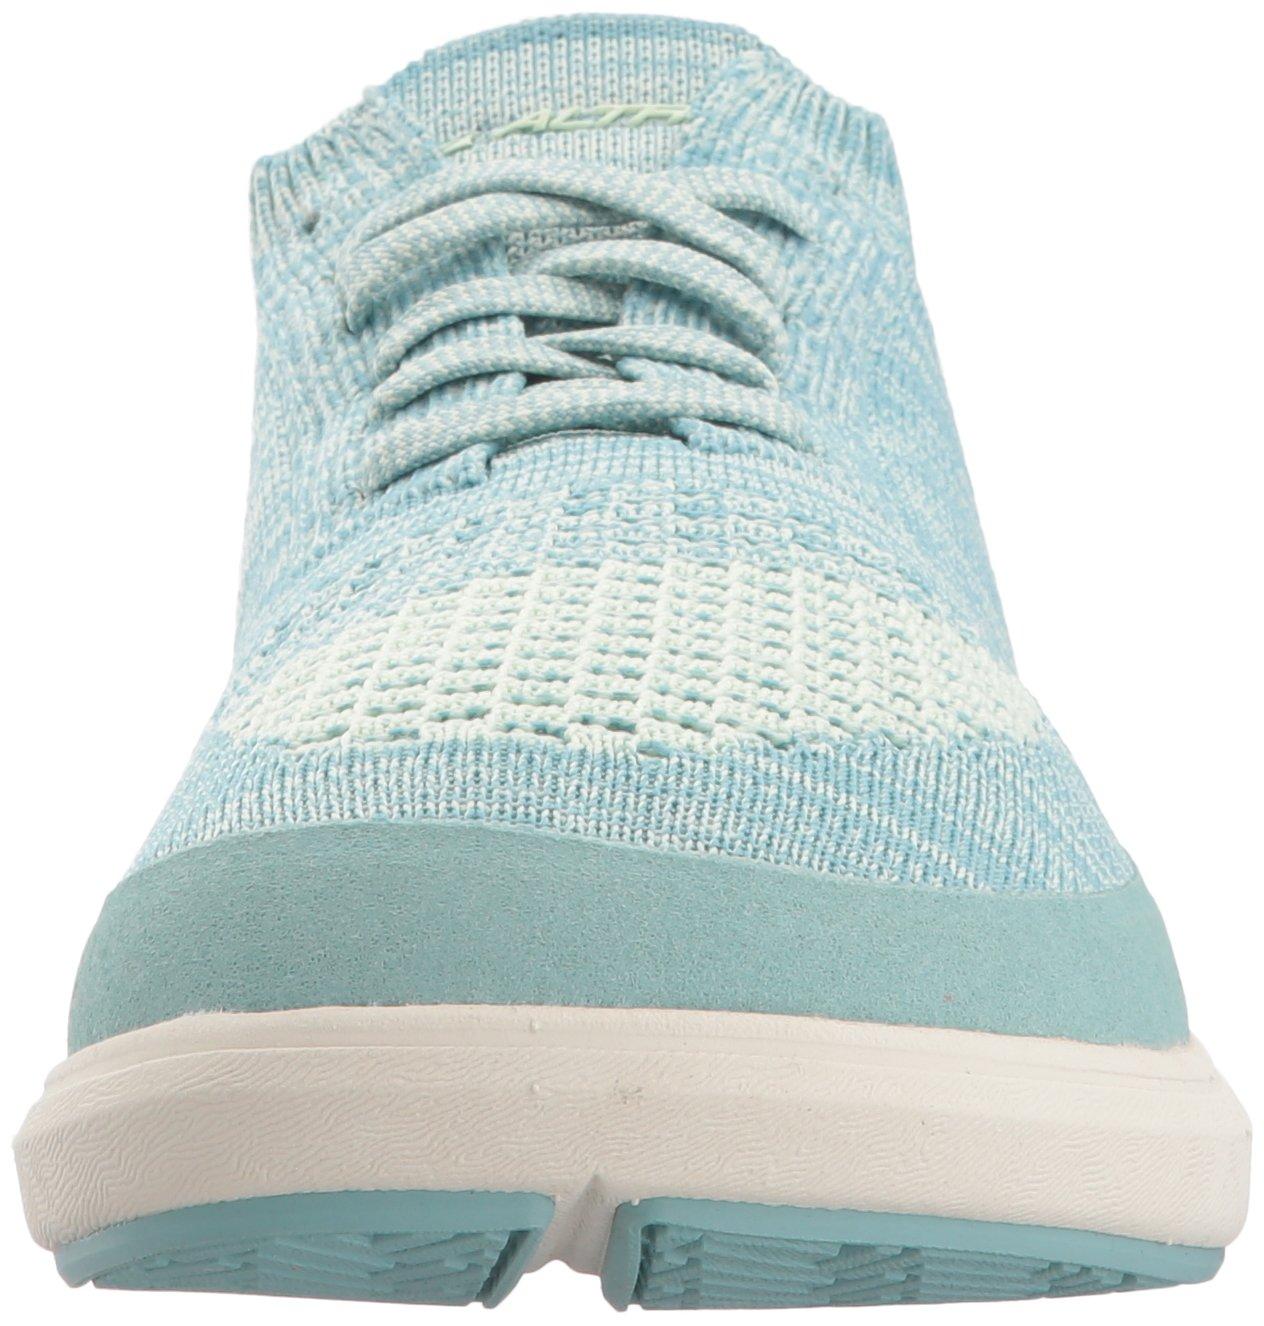 Altra 6.5 Women's Vali Sneaker B071FRS36Q 6.5 Altra B(M) US|Light Blue 060d3d